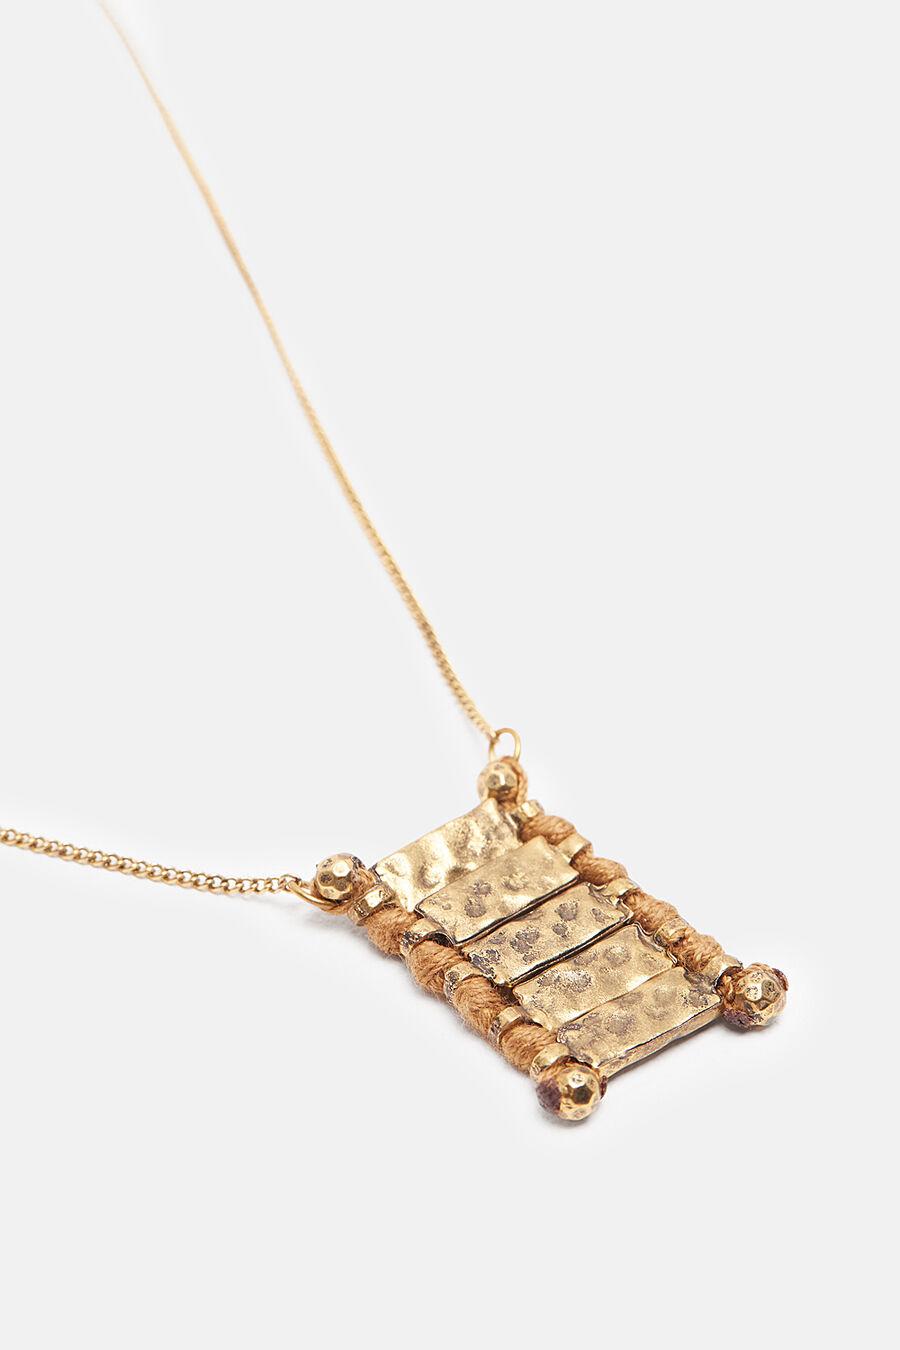 Metallic plates necklace